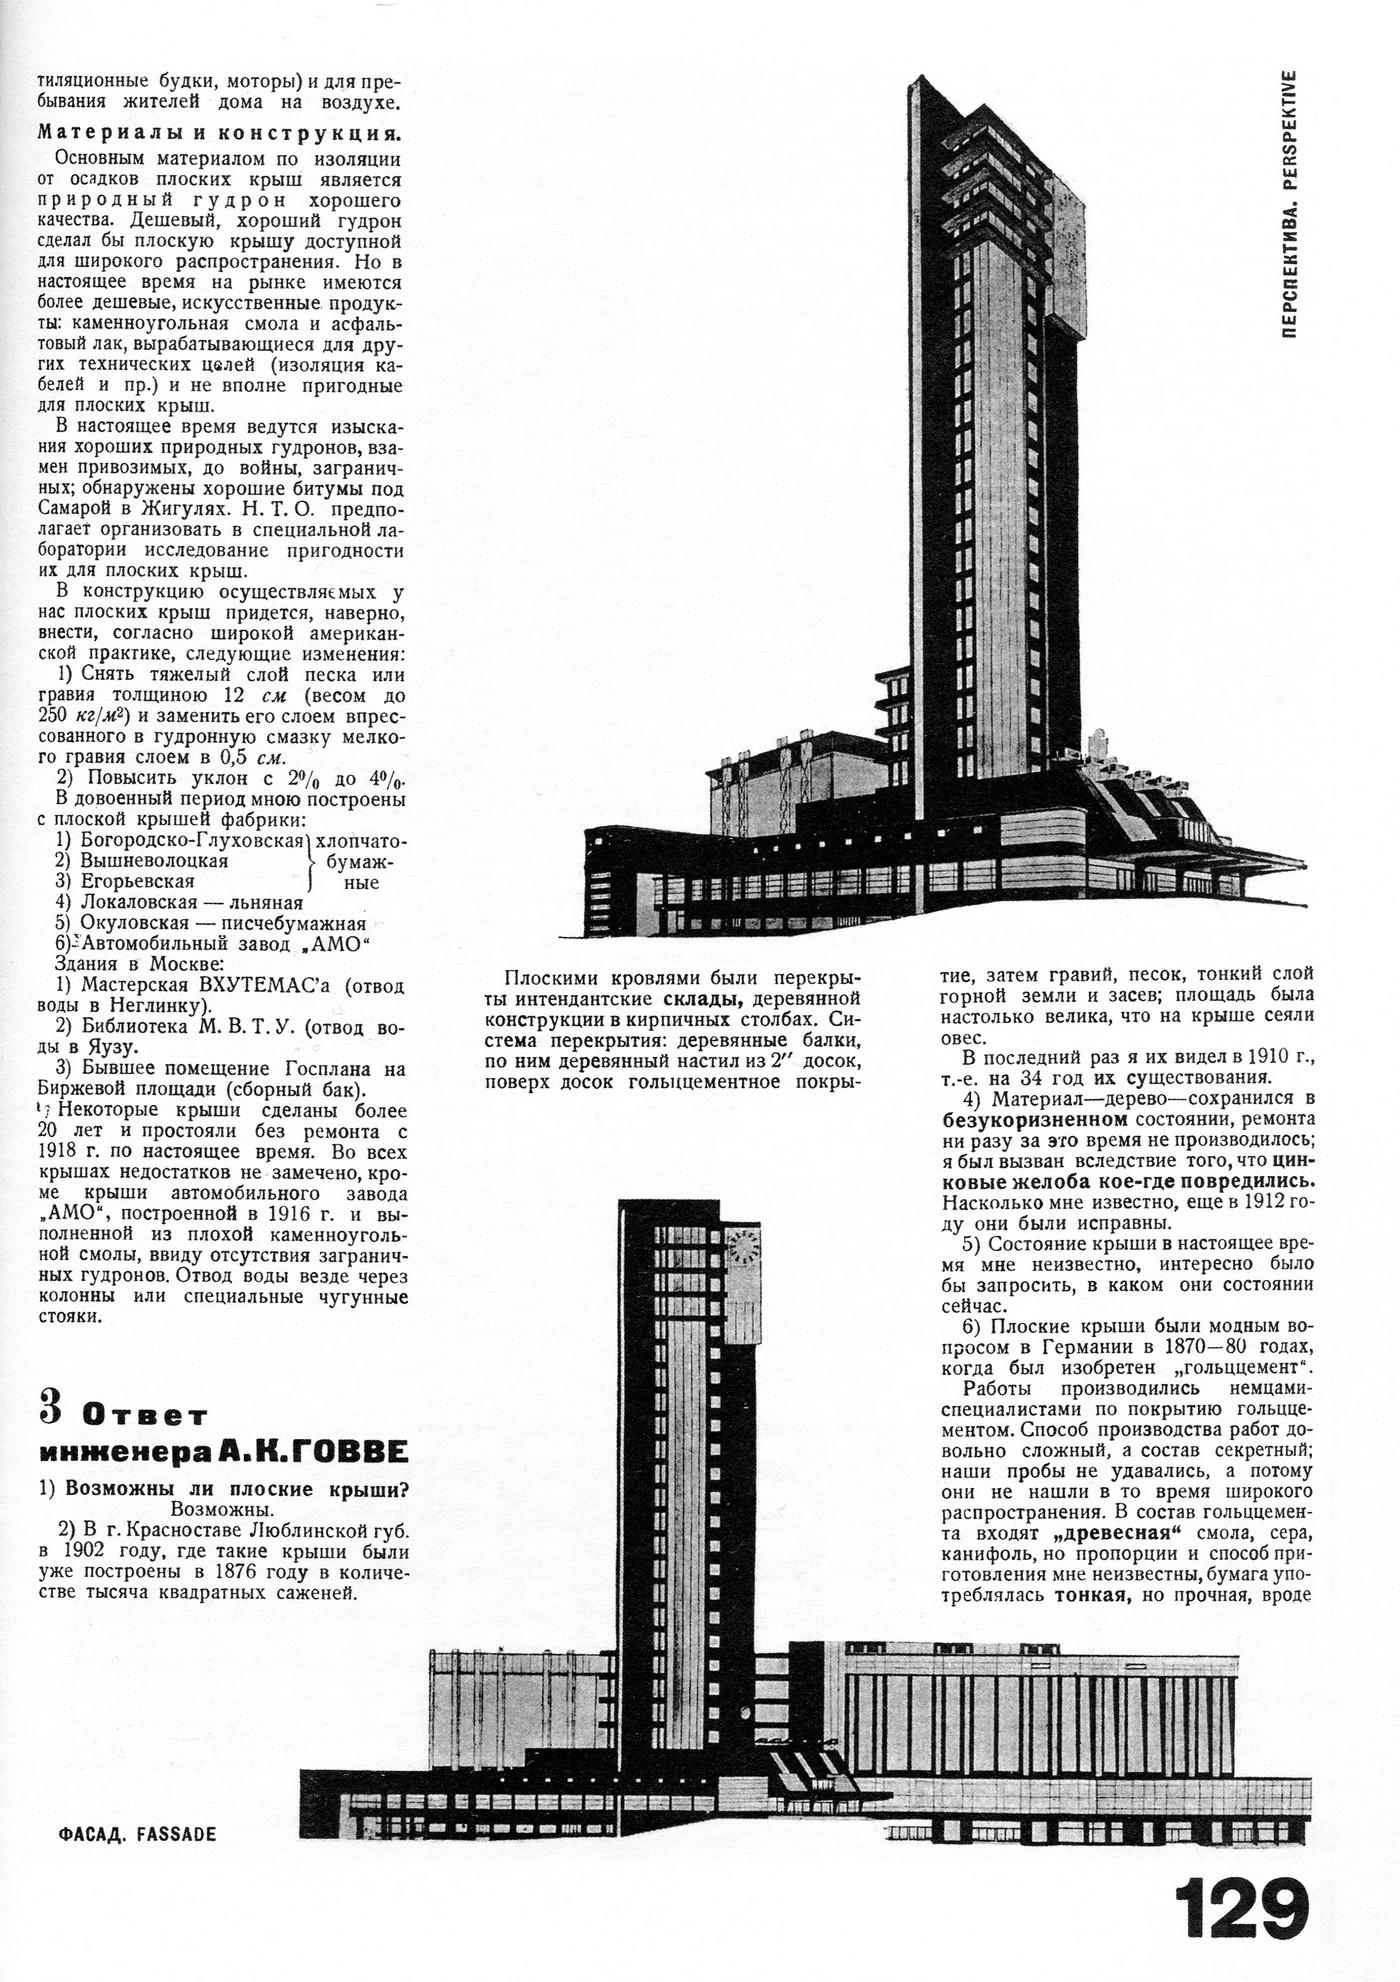 tehne.com-sa-1926-5-6-1400-0021